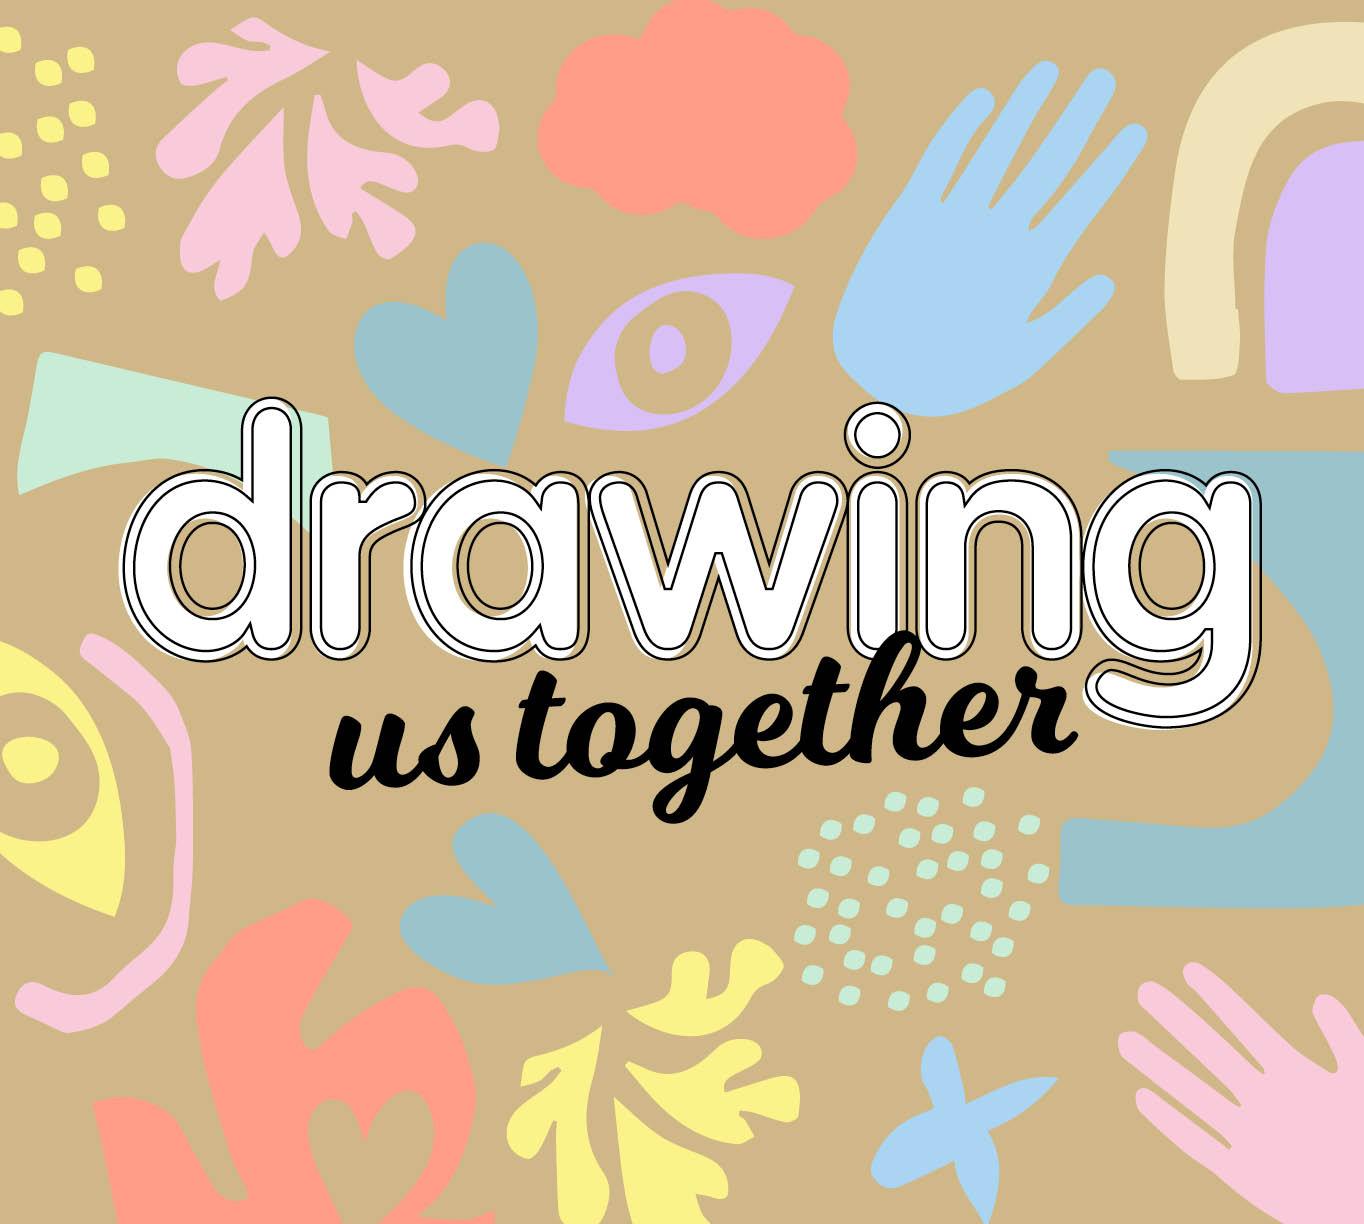 CH5251_Charter Hall_NAIDOC_Community Art Project_Web Tiles_Drawing_682x612